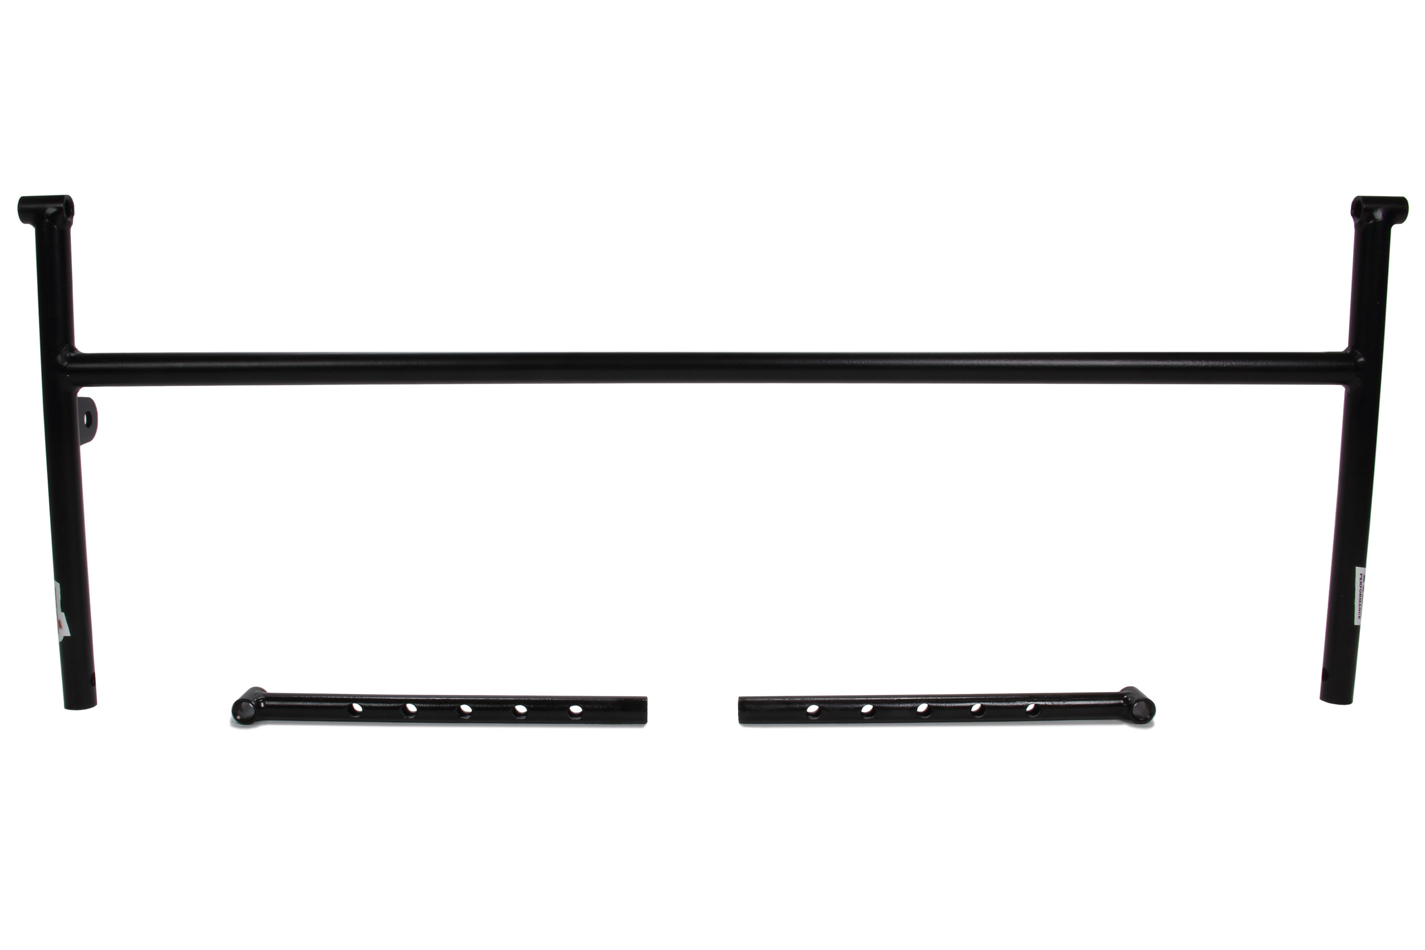 Ti22 Performance 600 Top Wing Tree Black 25 x 11